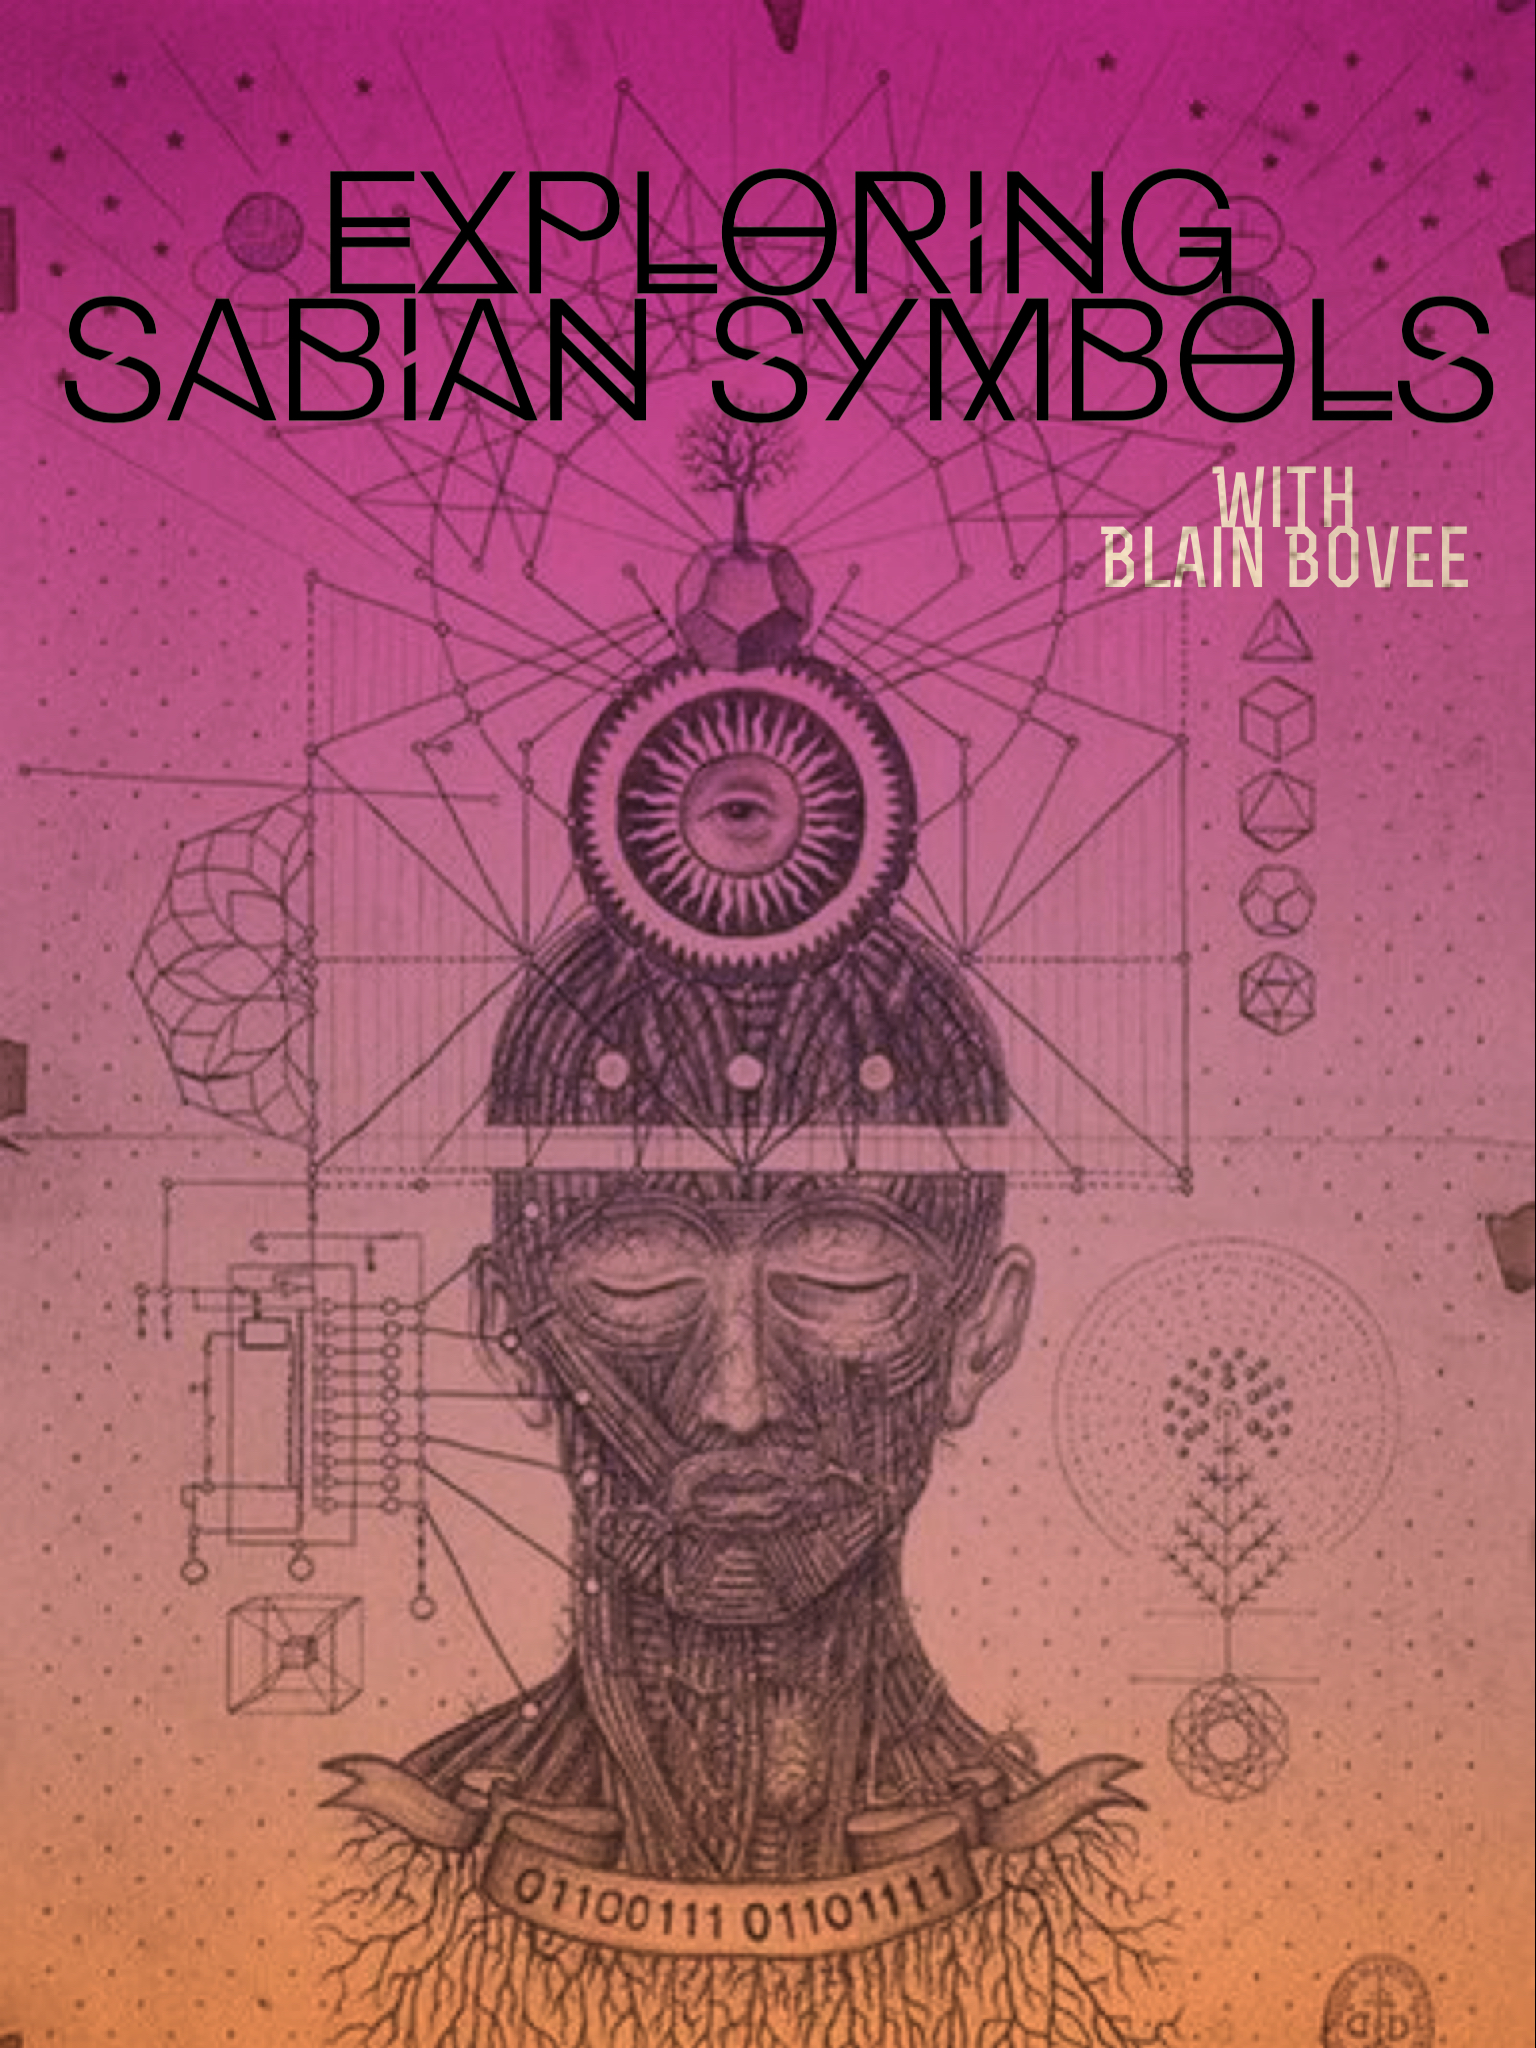 Exploring Sabian Symbols with Blain Bovee